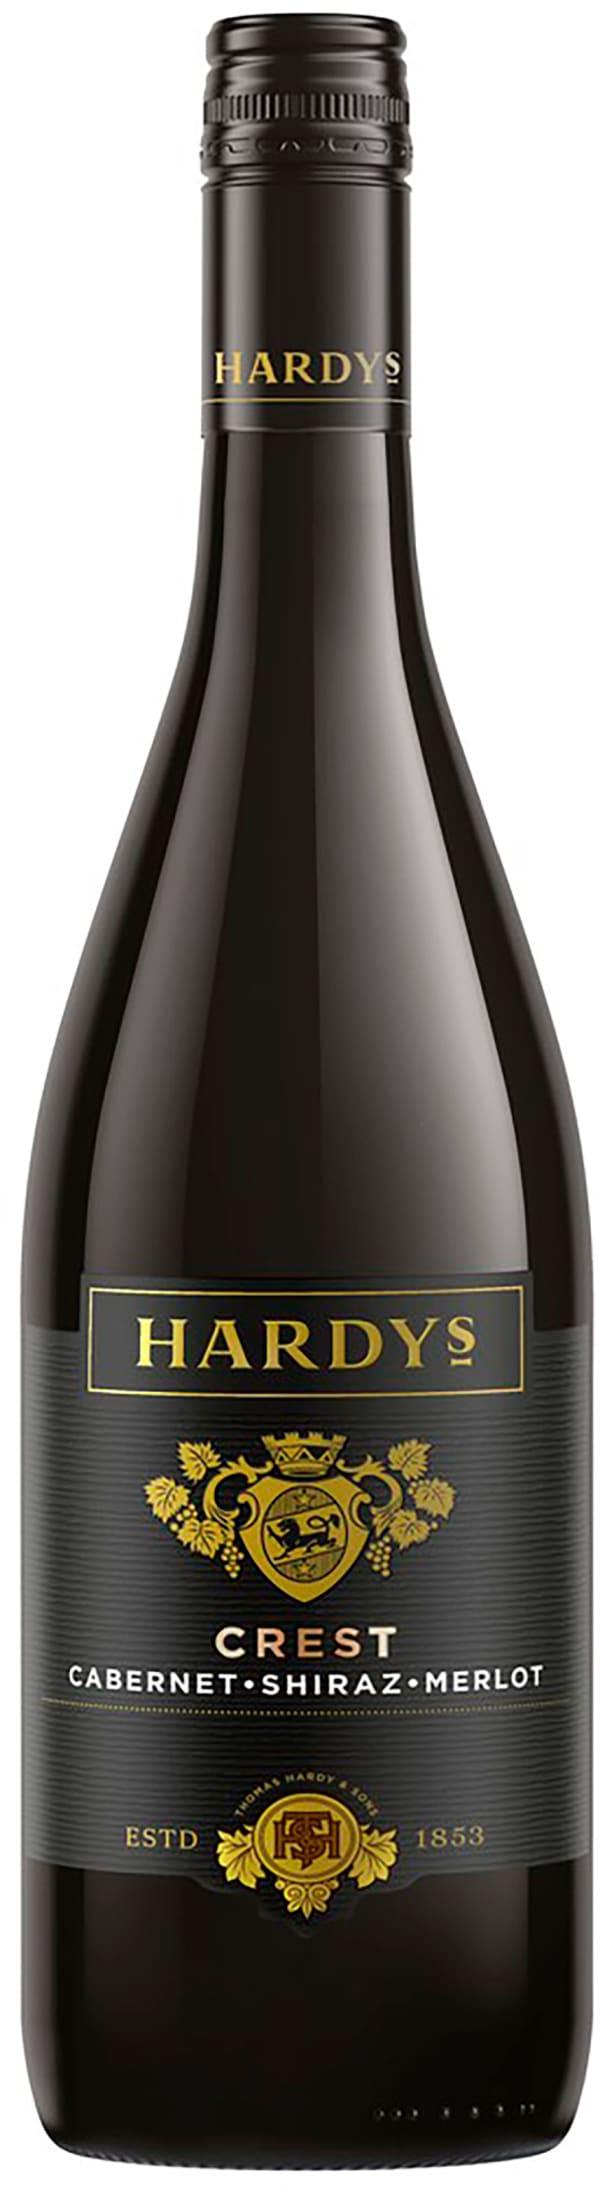 Hardys Crest Cabernet Shiraz Merlot 2018